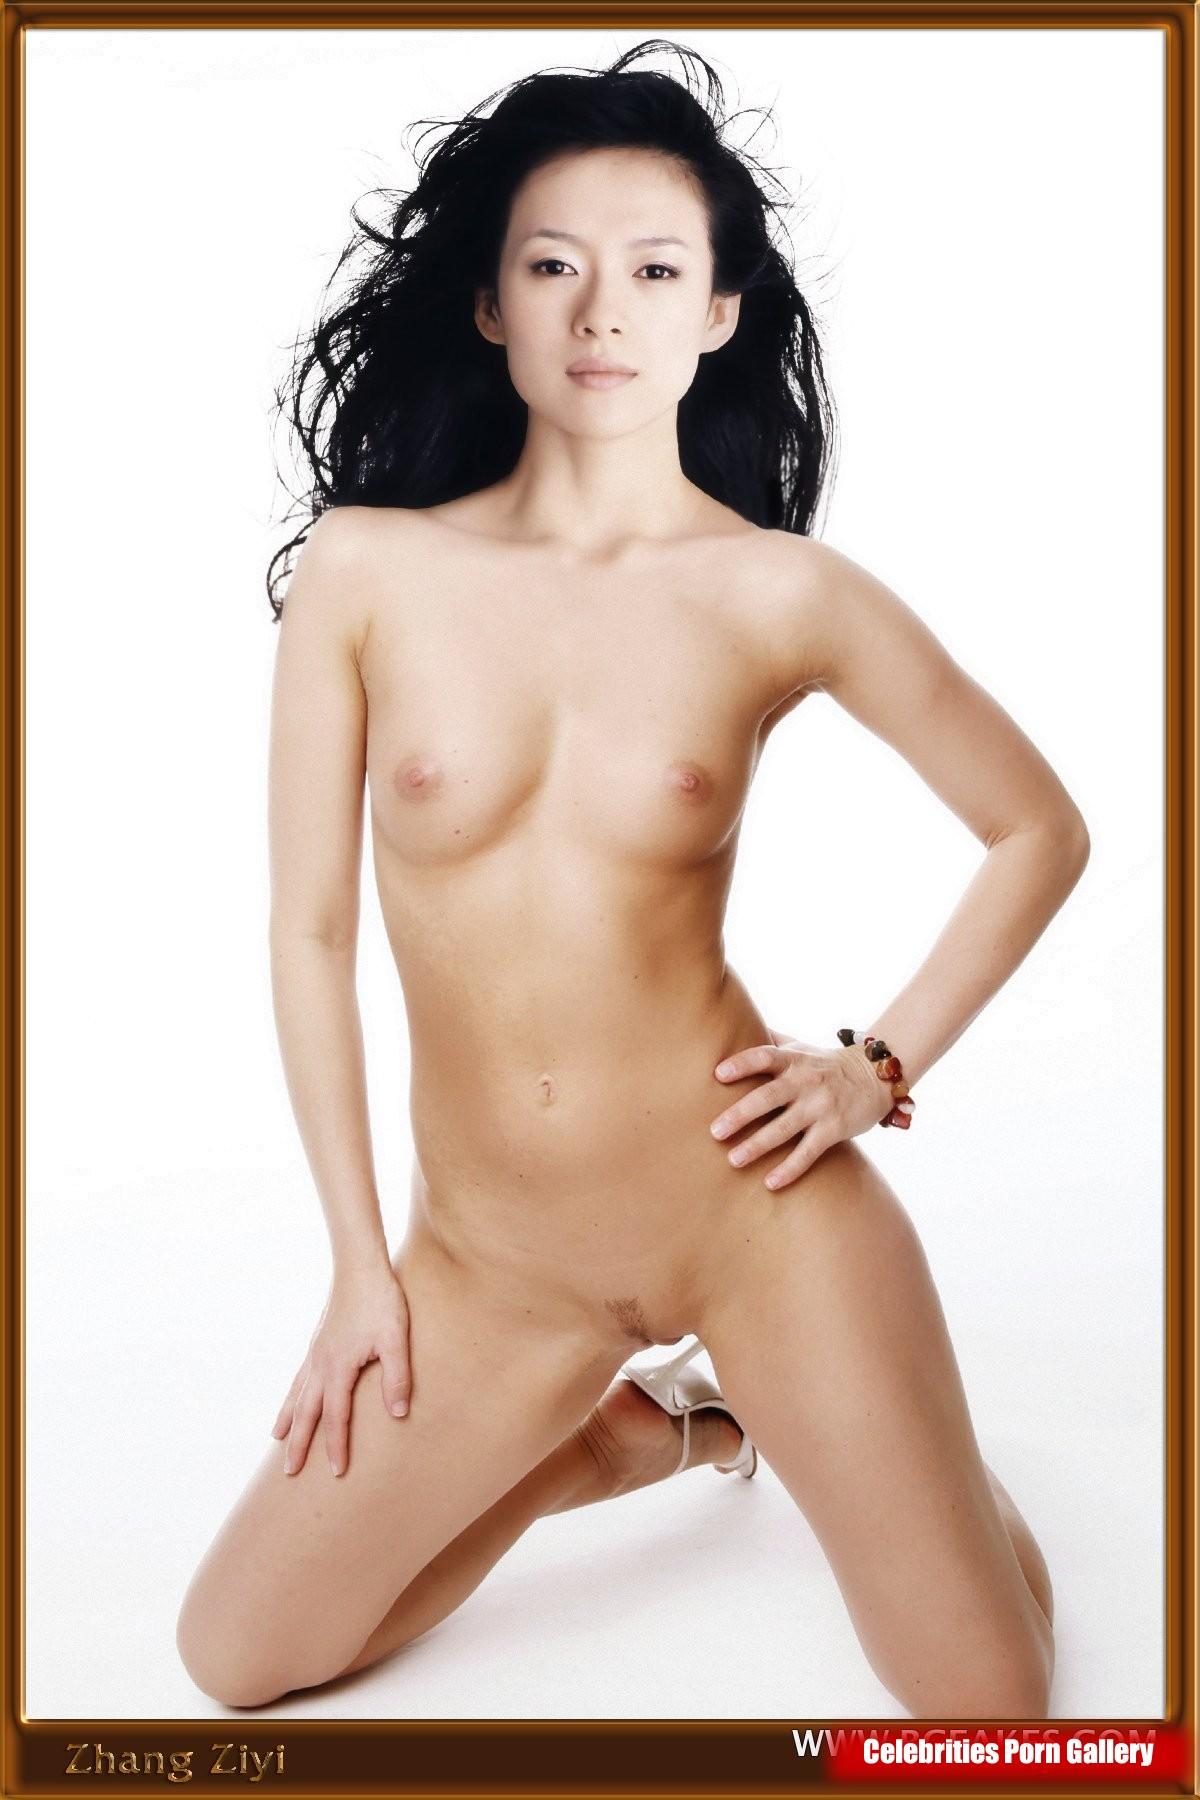 Zhang Ziyi Hot Naked Celebs free nude celeb pics